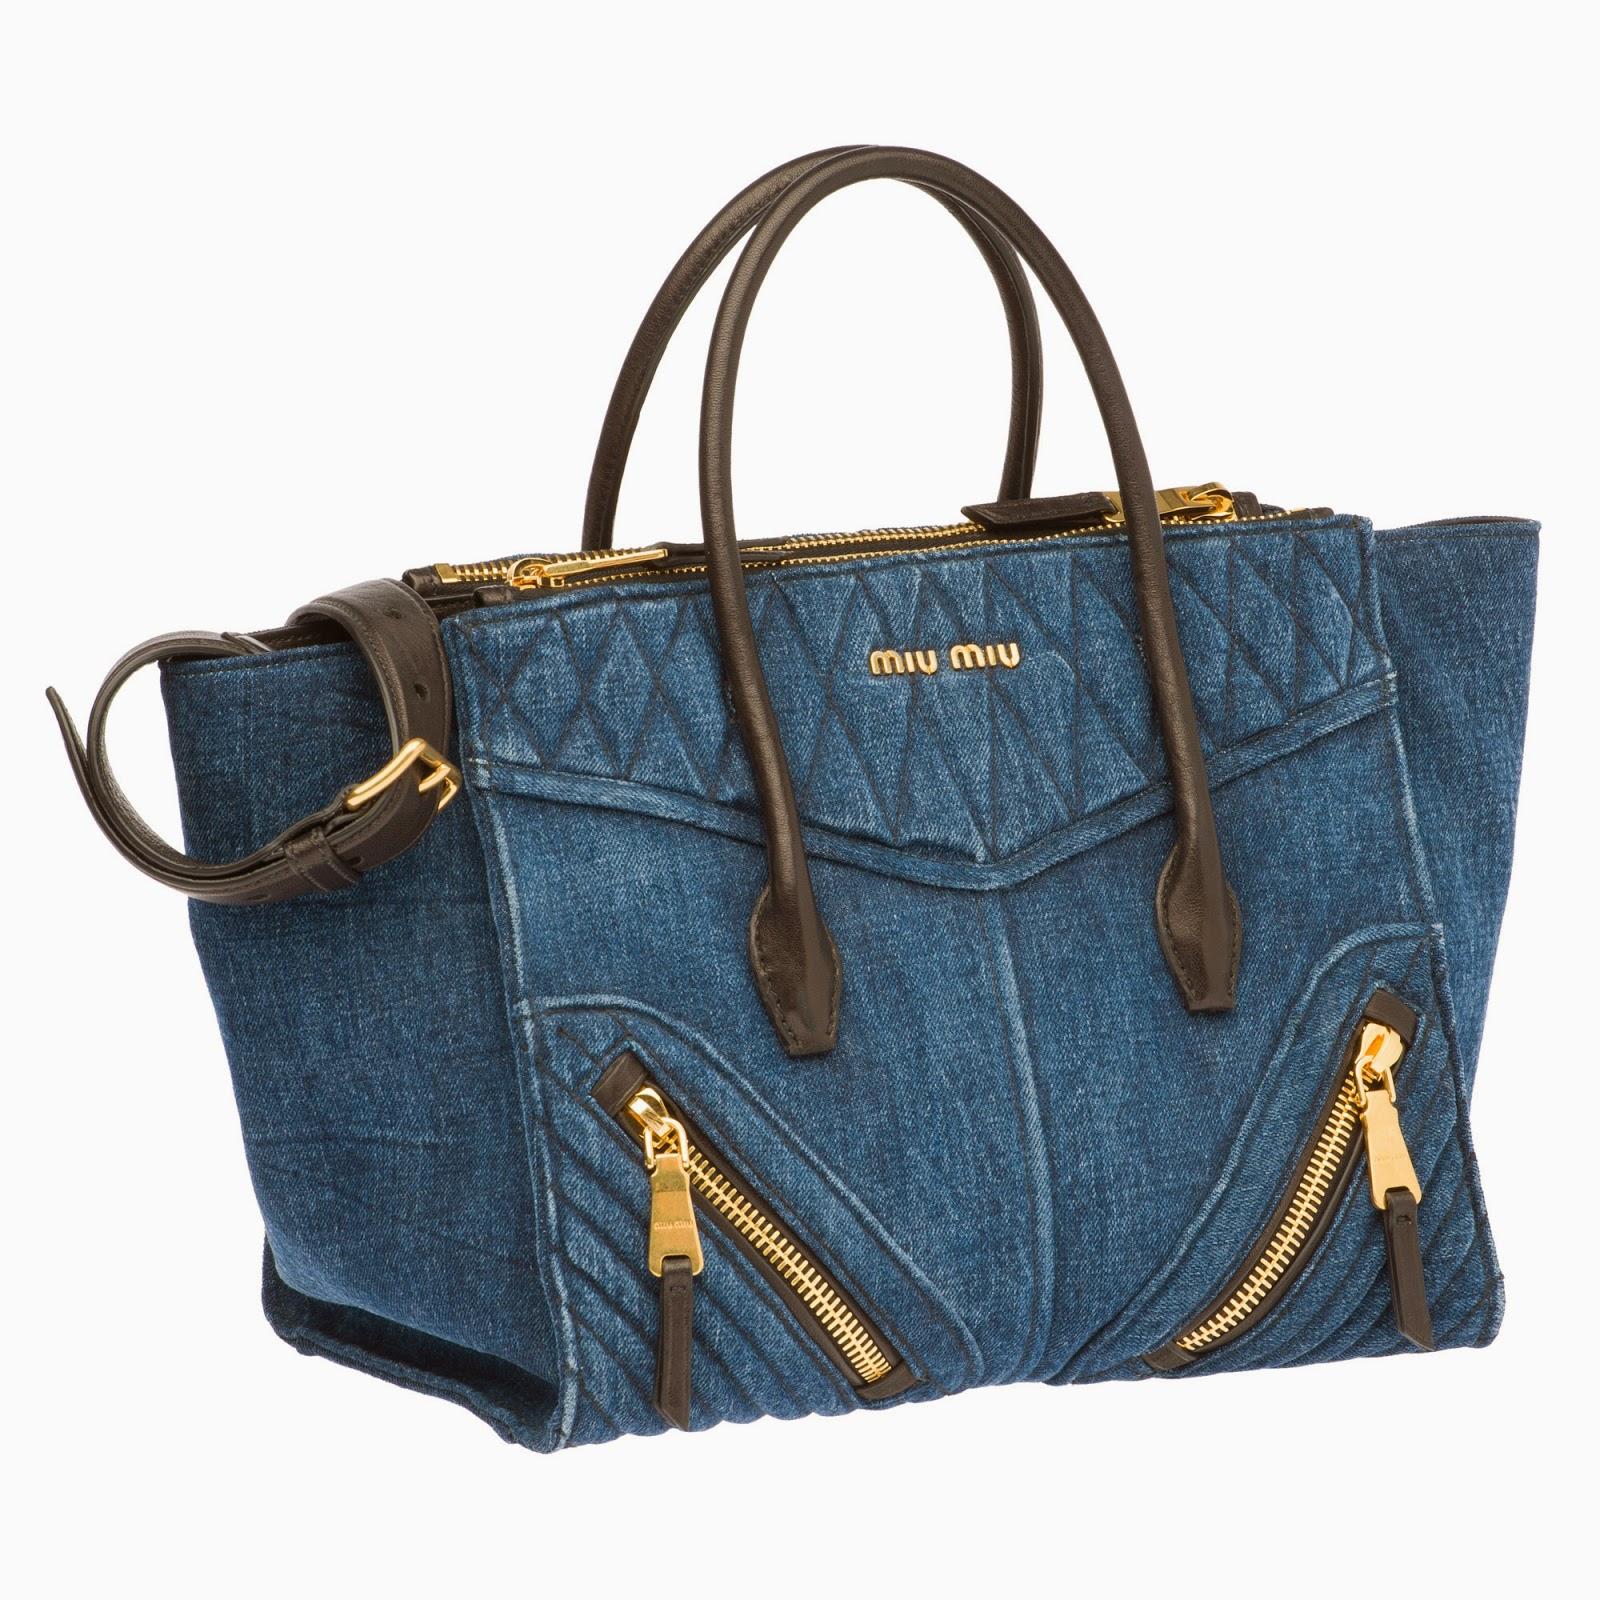 denim+tote Miu Miu Herbst Winter 2014 Handtaschen Modelle